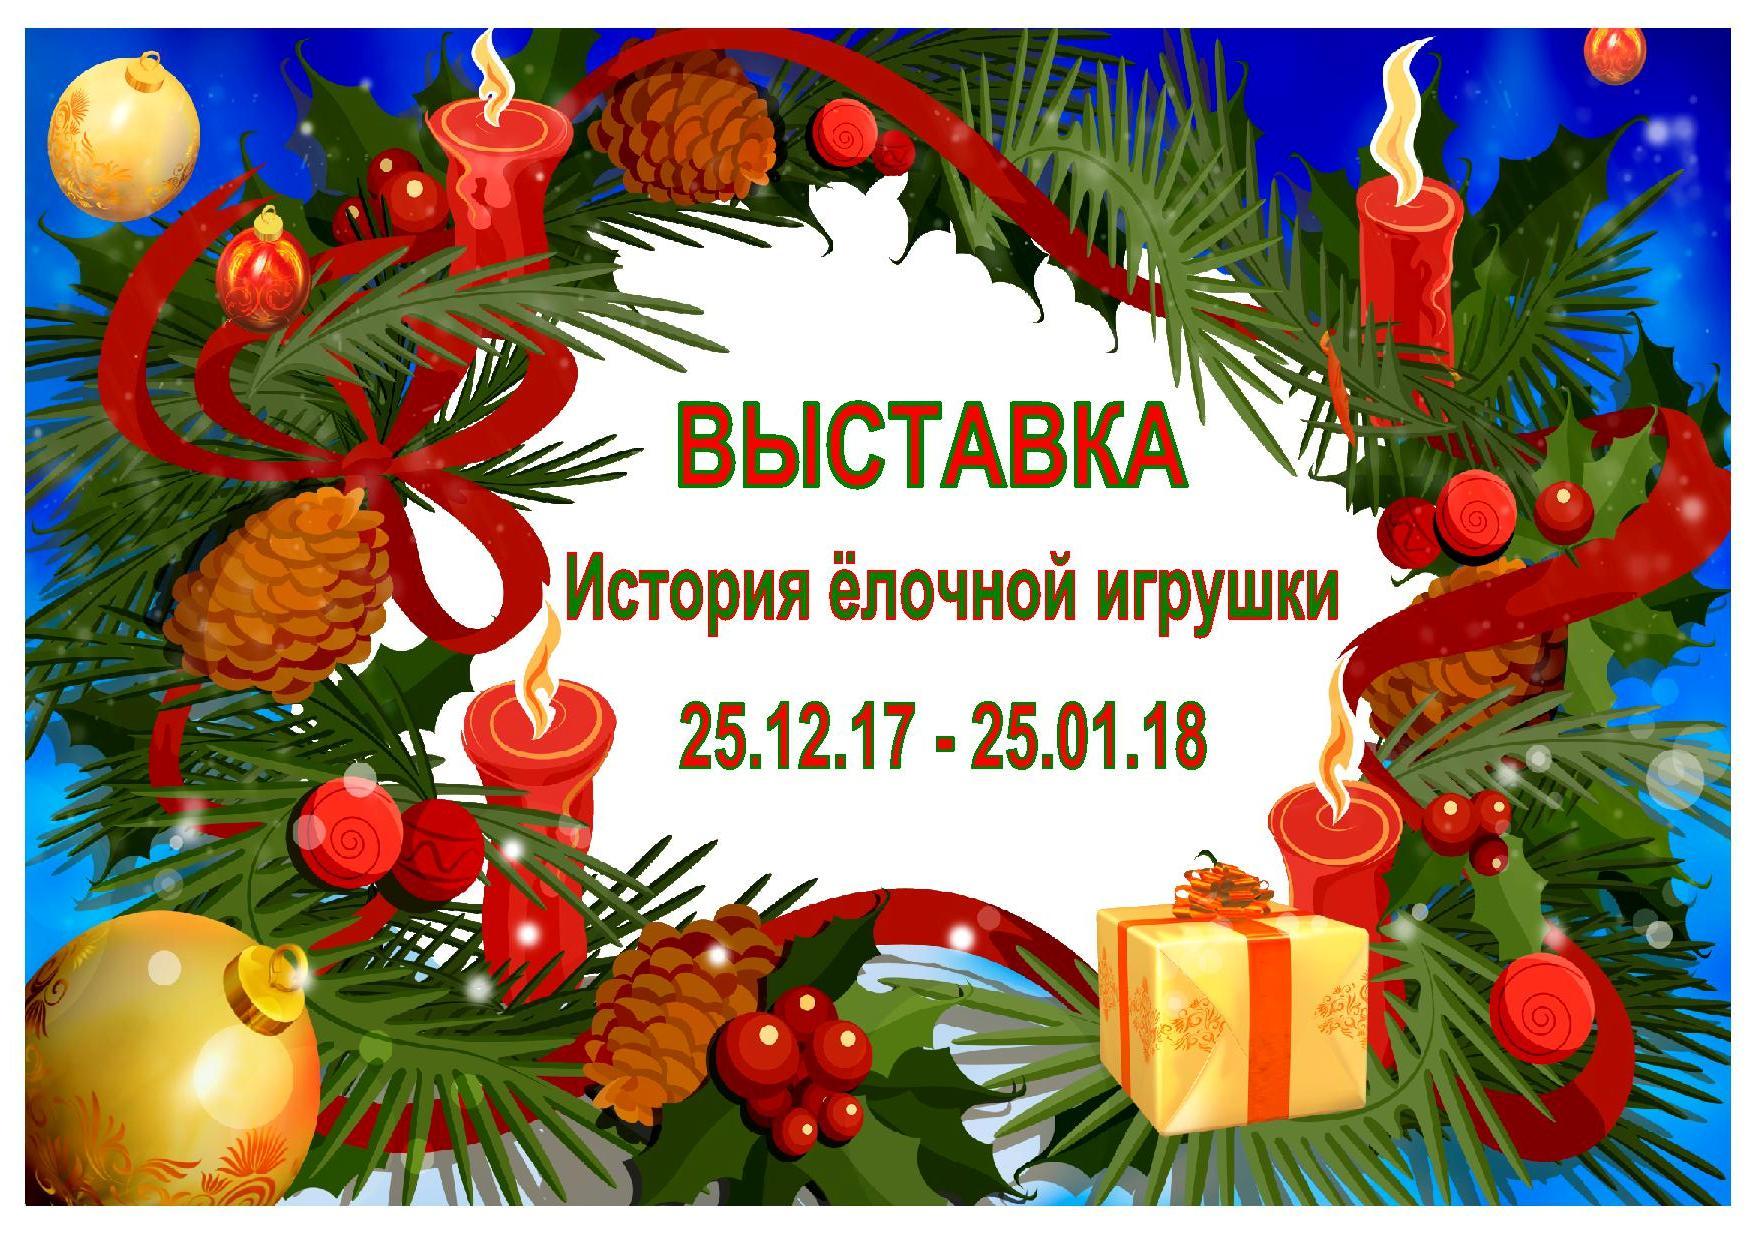 https://pp.userapi.com/c834200/v834200336/51b71/xUjy9NU4Wo8.jpg